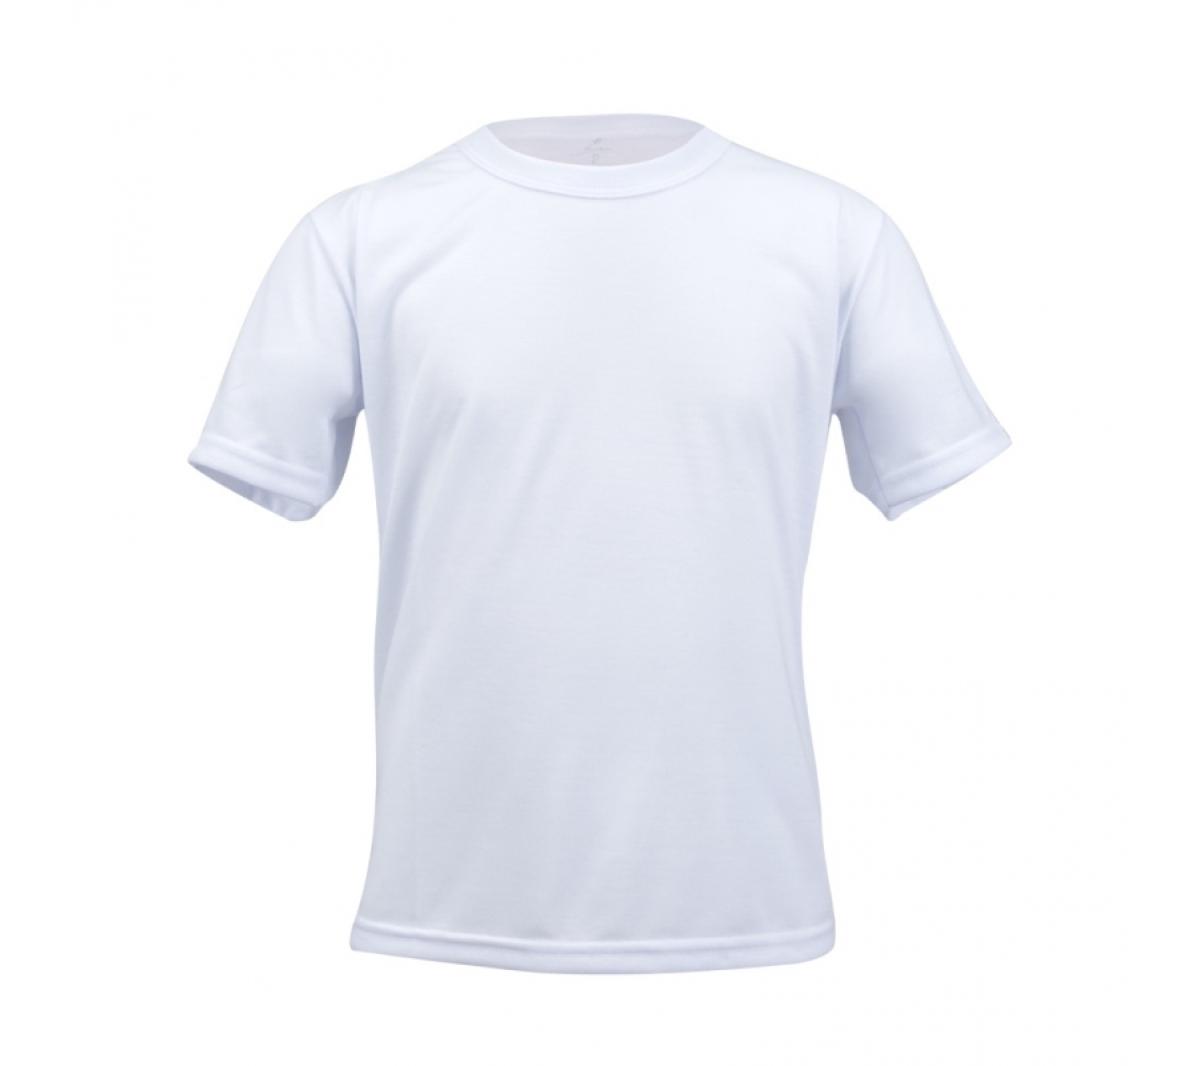 Vestuário Camisetas personalizadas Brinde camiseta em poliéster infantil -  FBCP-19114 0f6eaabeed8